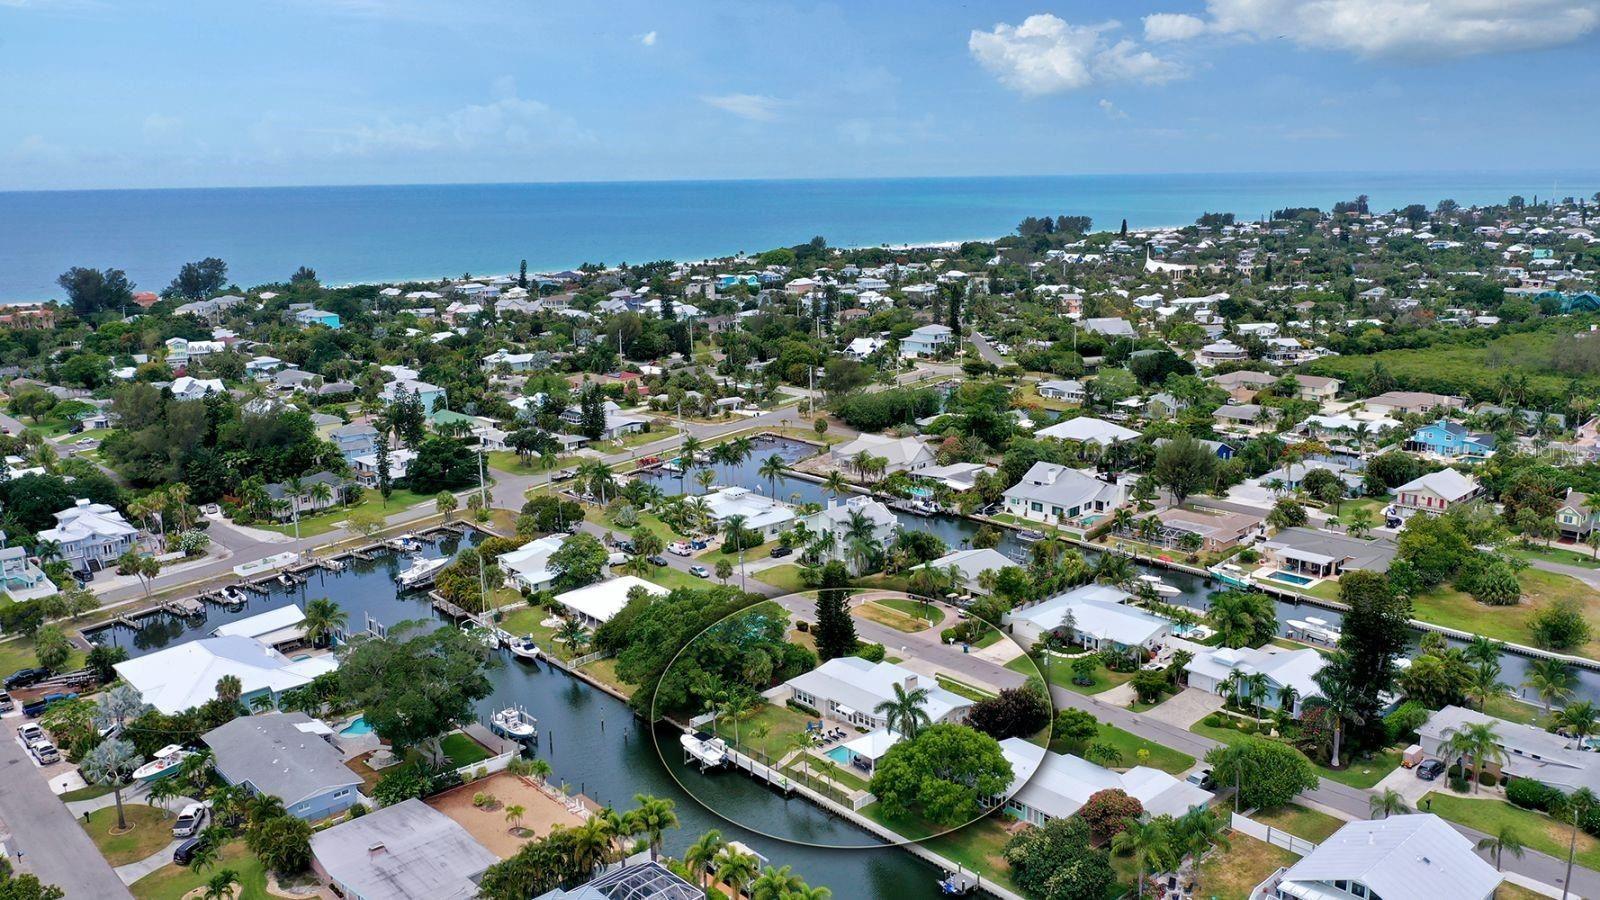 Photo of 507 74TH STREET, HOLMES BEACH, FL 34217 (MLS # A4511183)